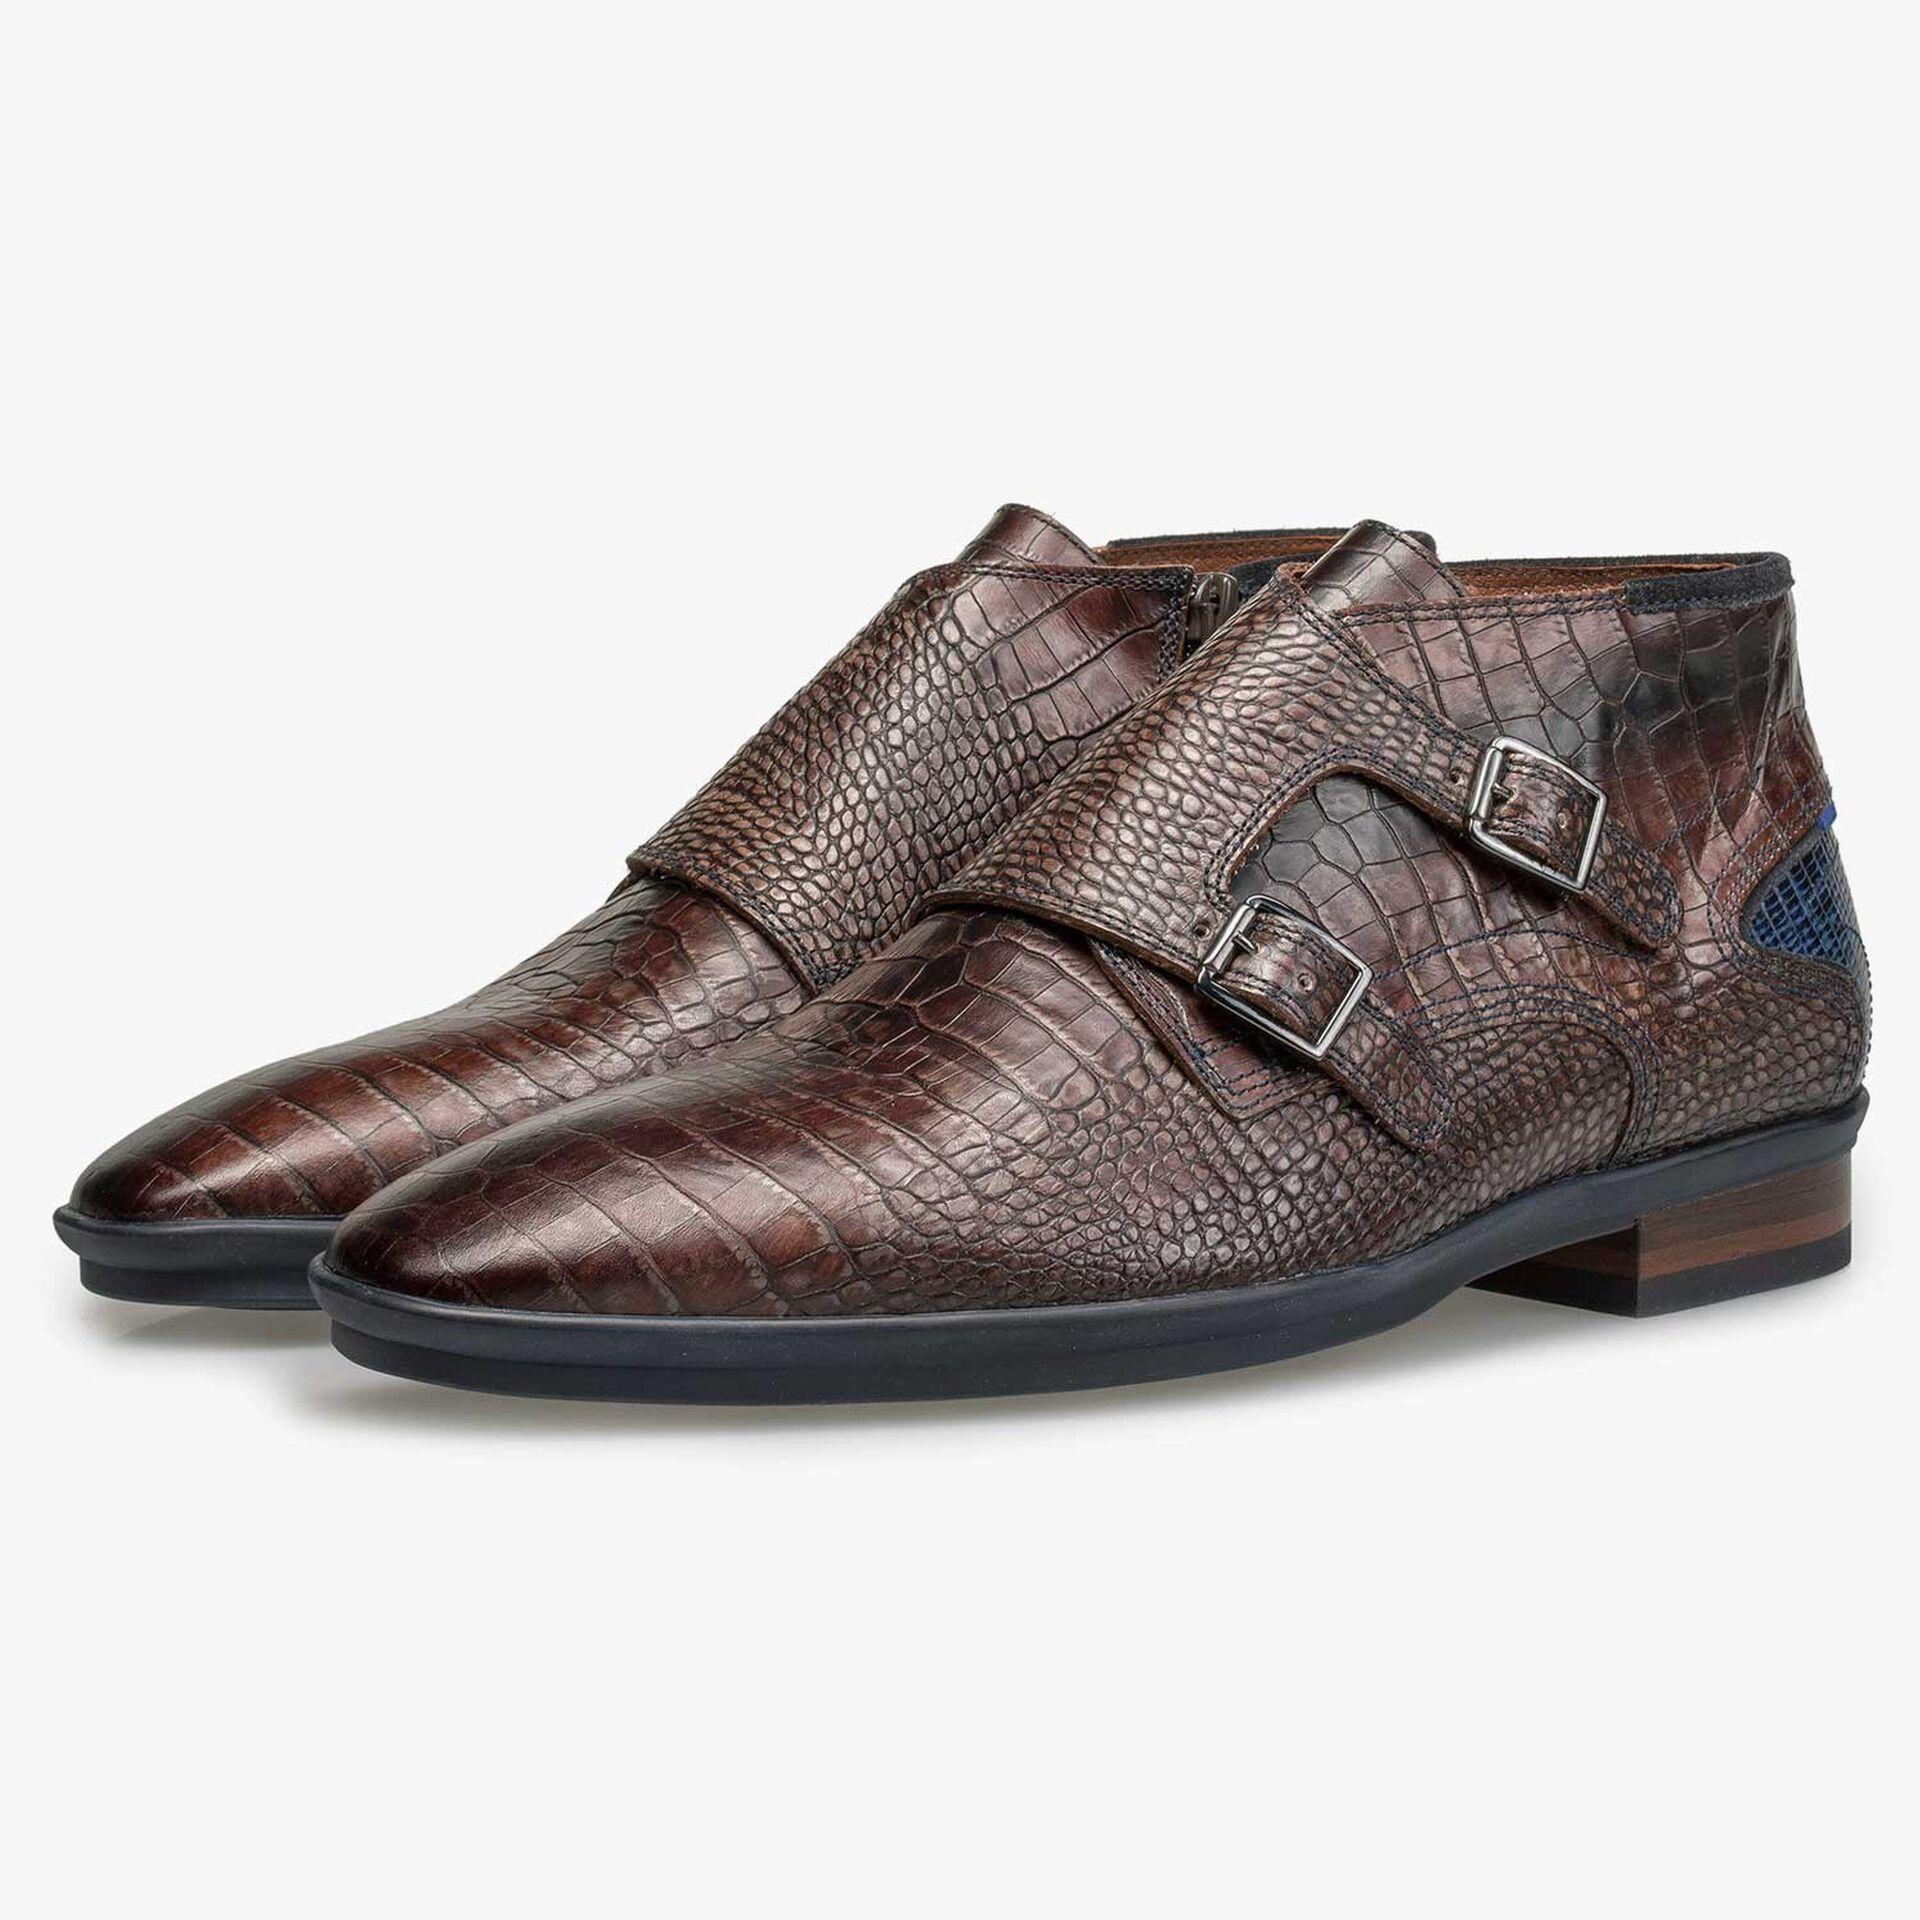 Dark brown buckled shoe with croco print